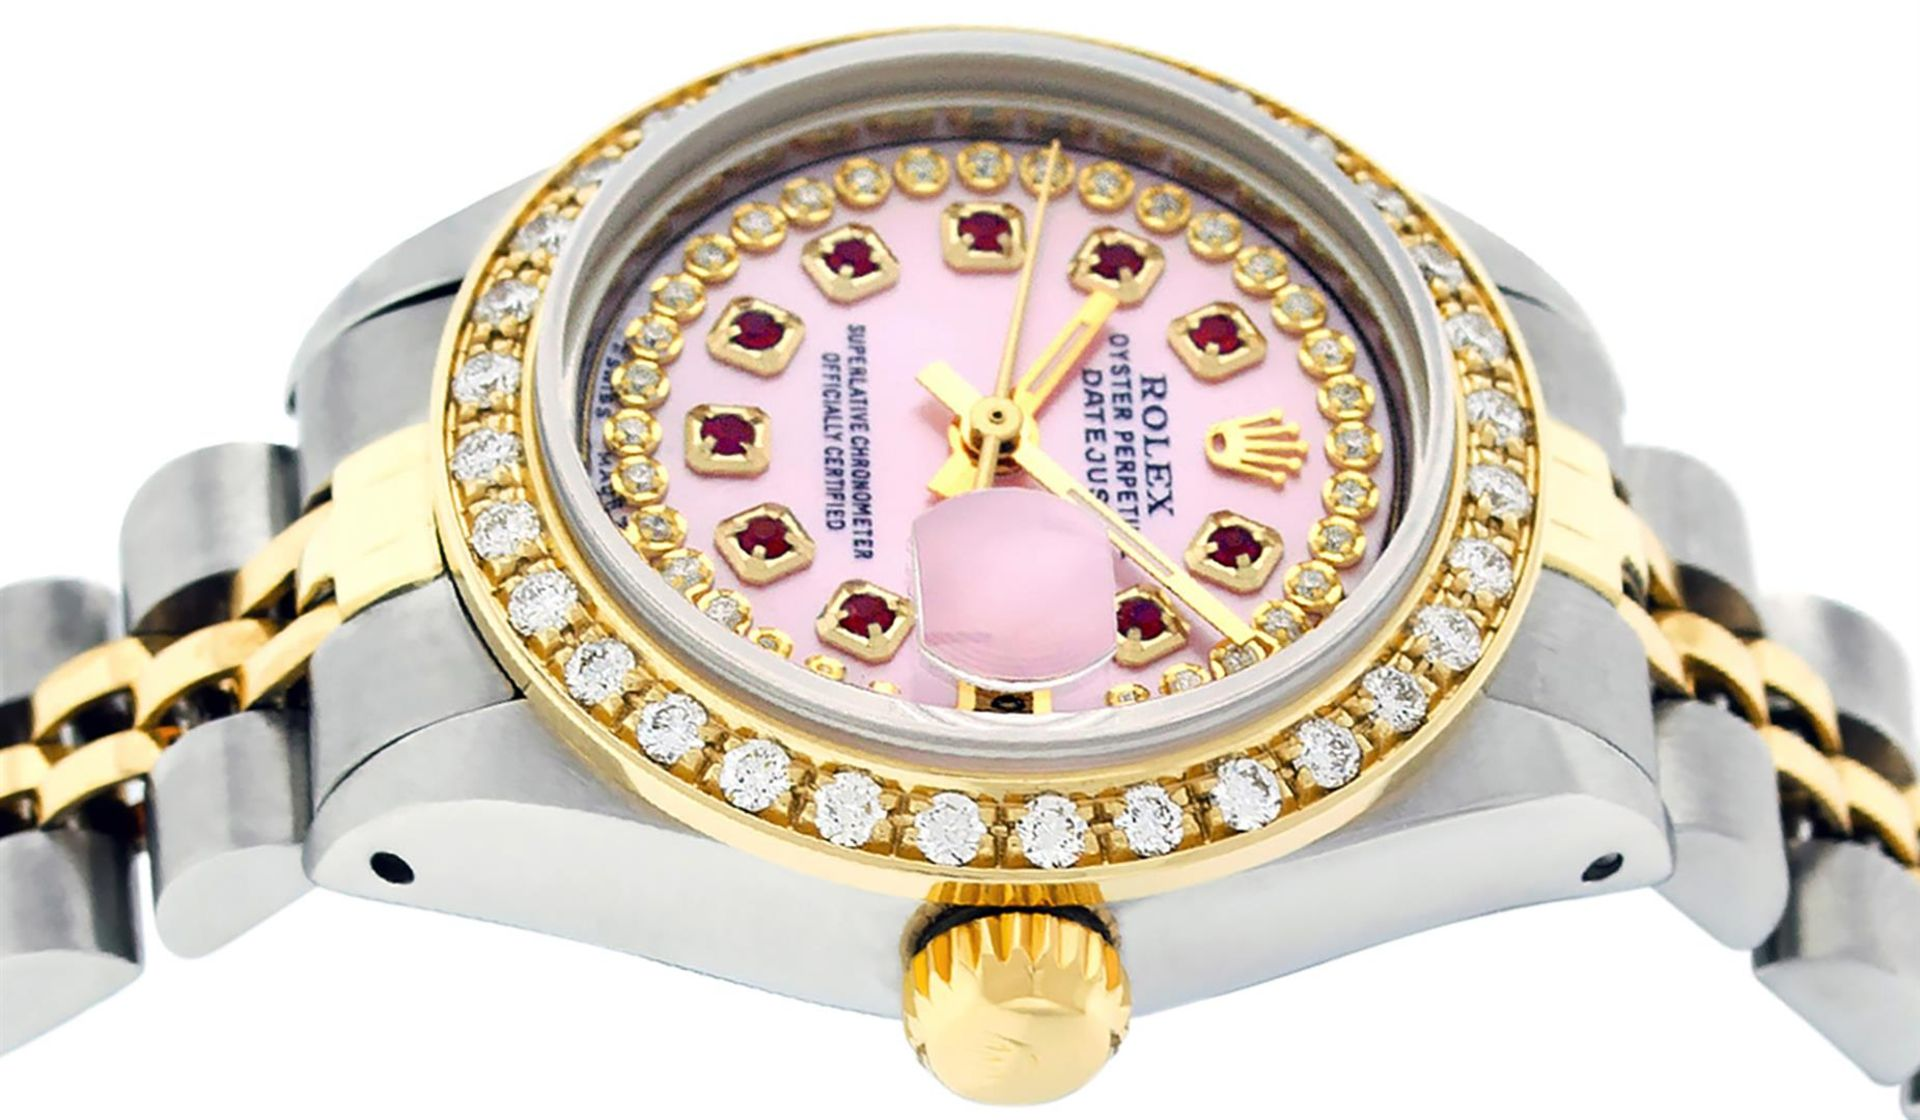 Rolex Ladies 2 Tone Pink MOP Ruby String Diamond Datejust Wristwatch - Image 3 of 9